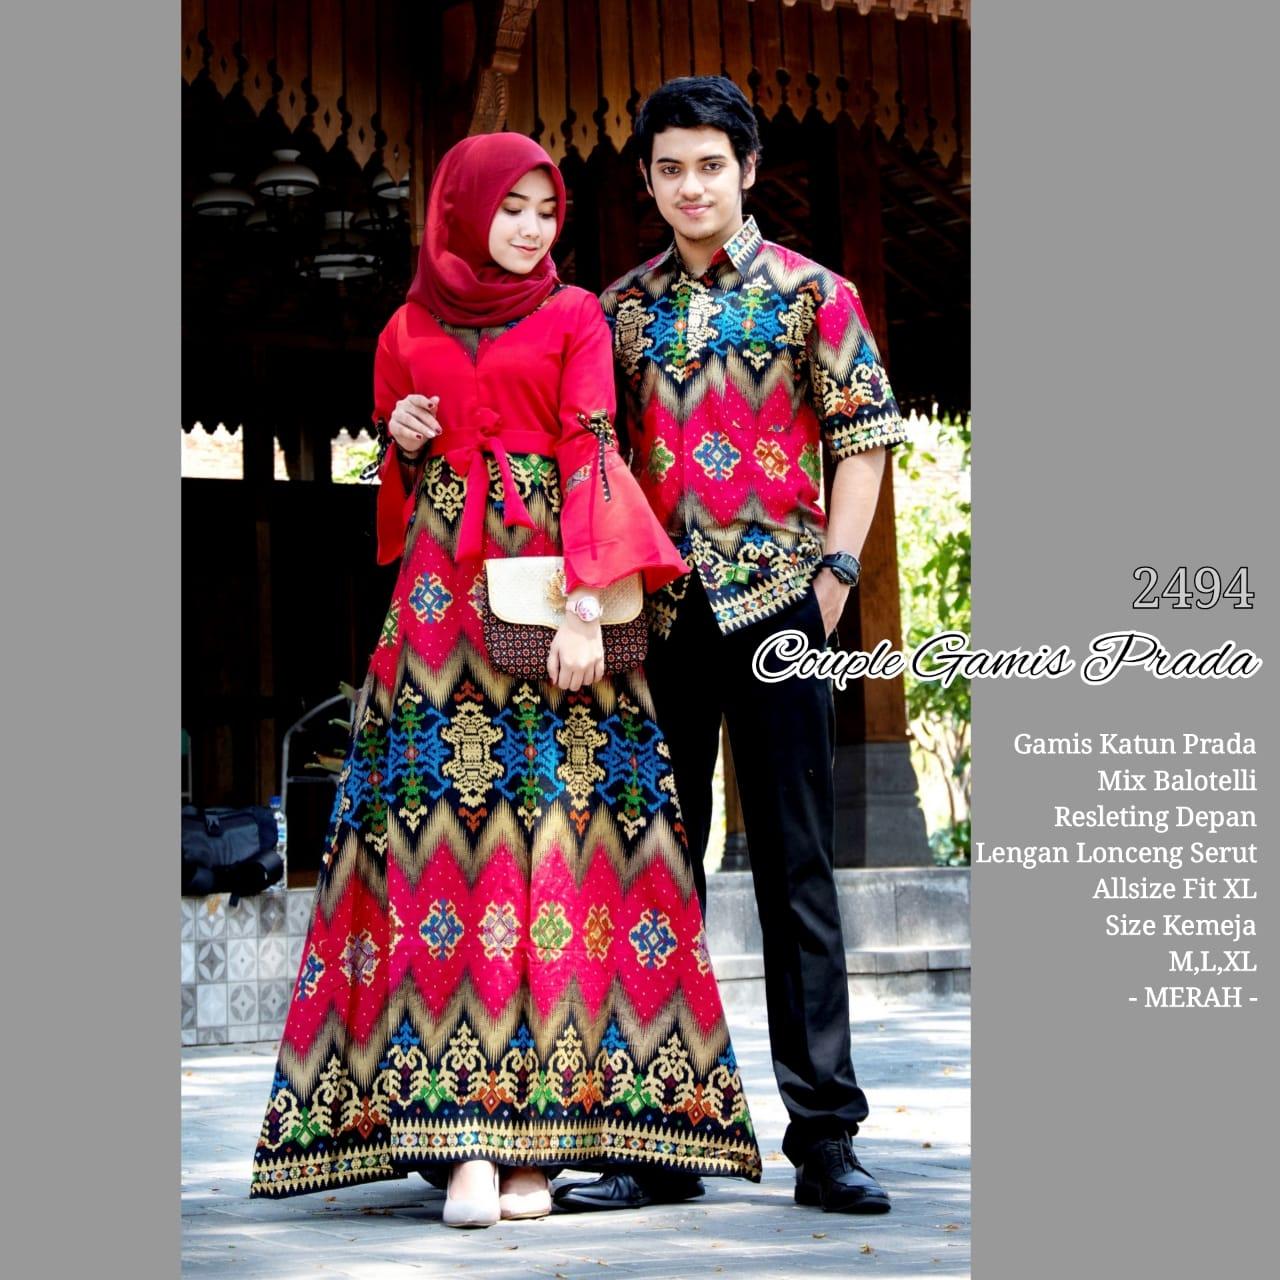 Baju Batik Couple Model Gamis Katun Prada Mix Balotelly Lengan